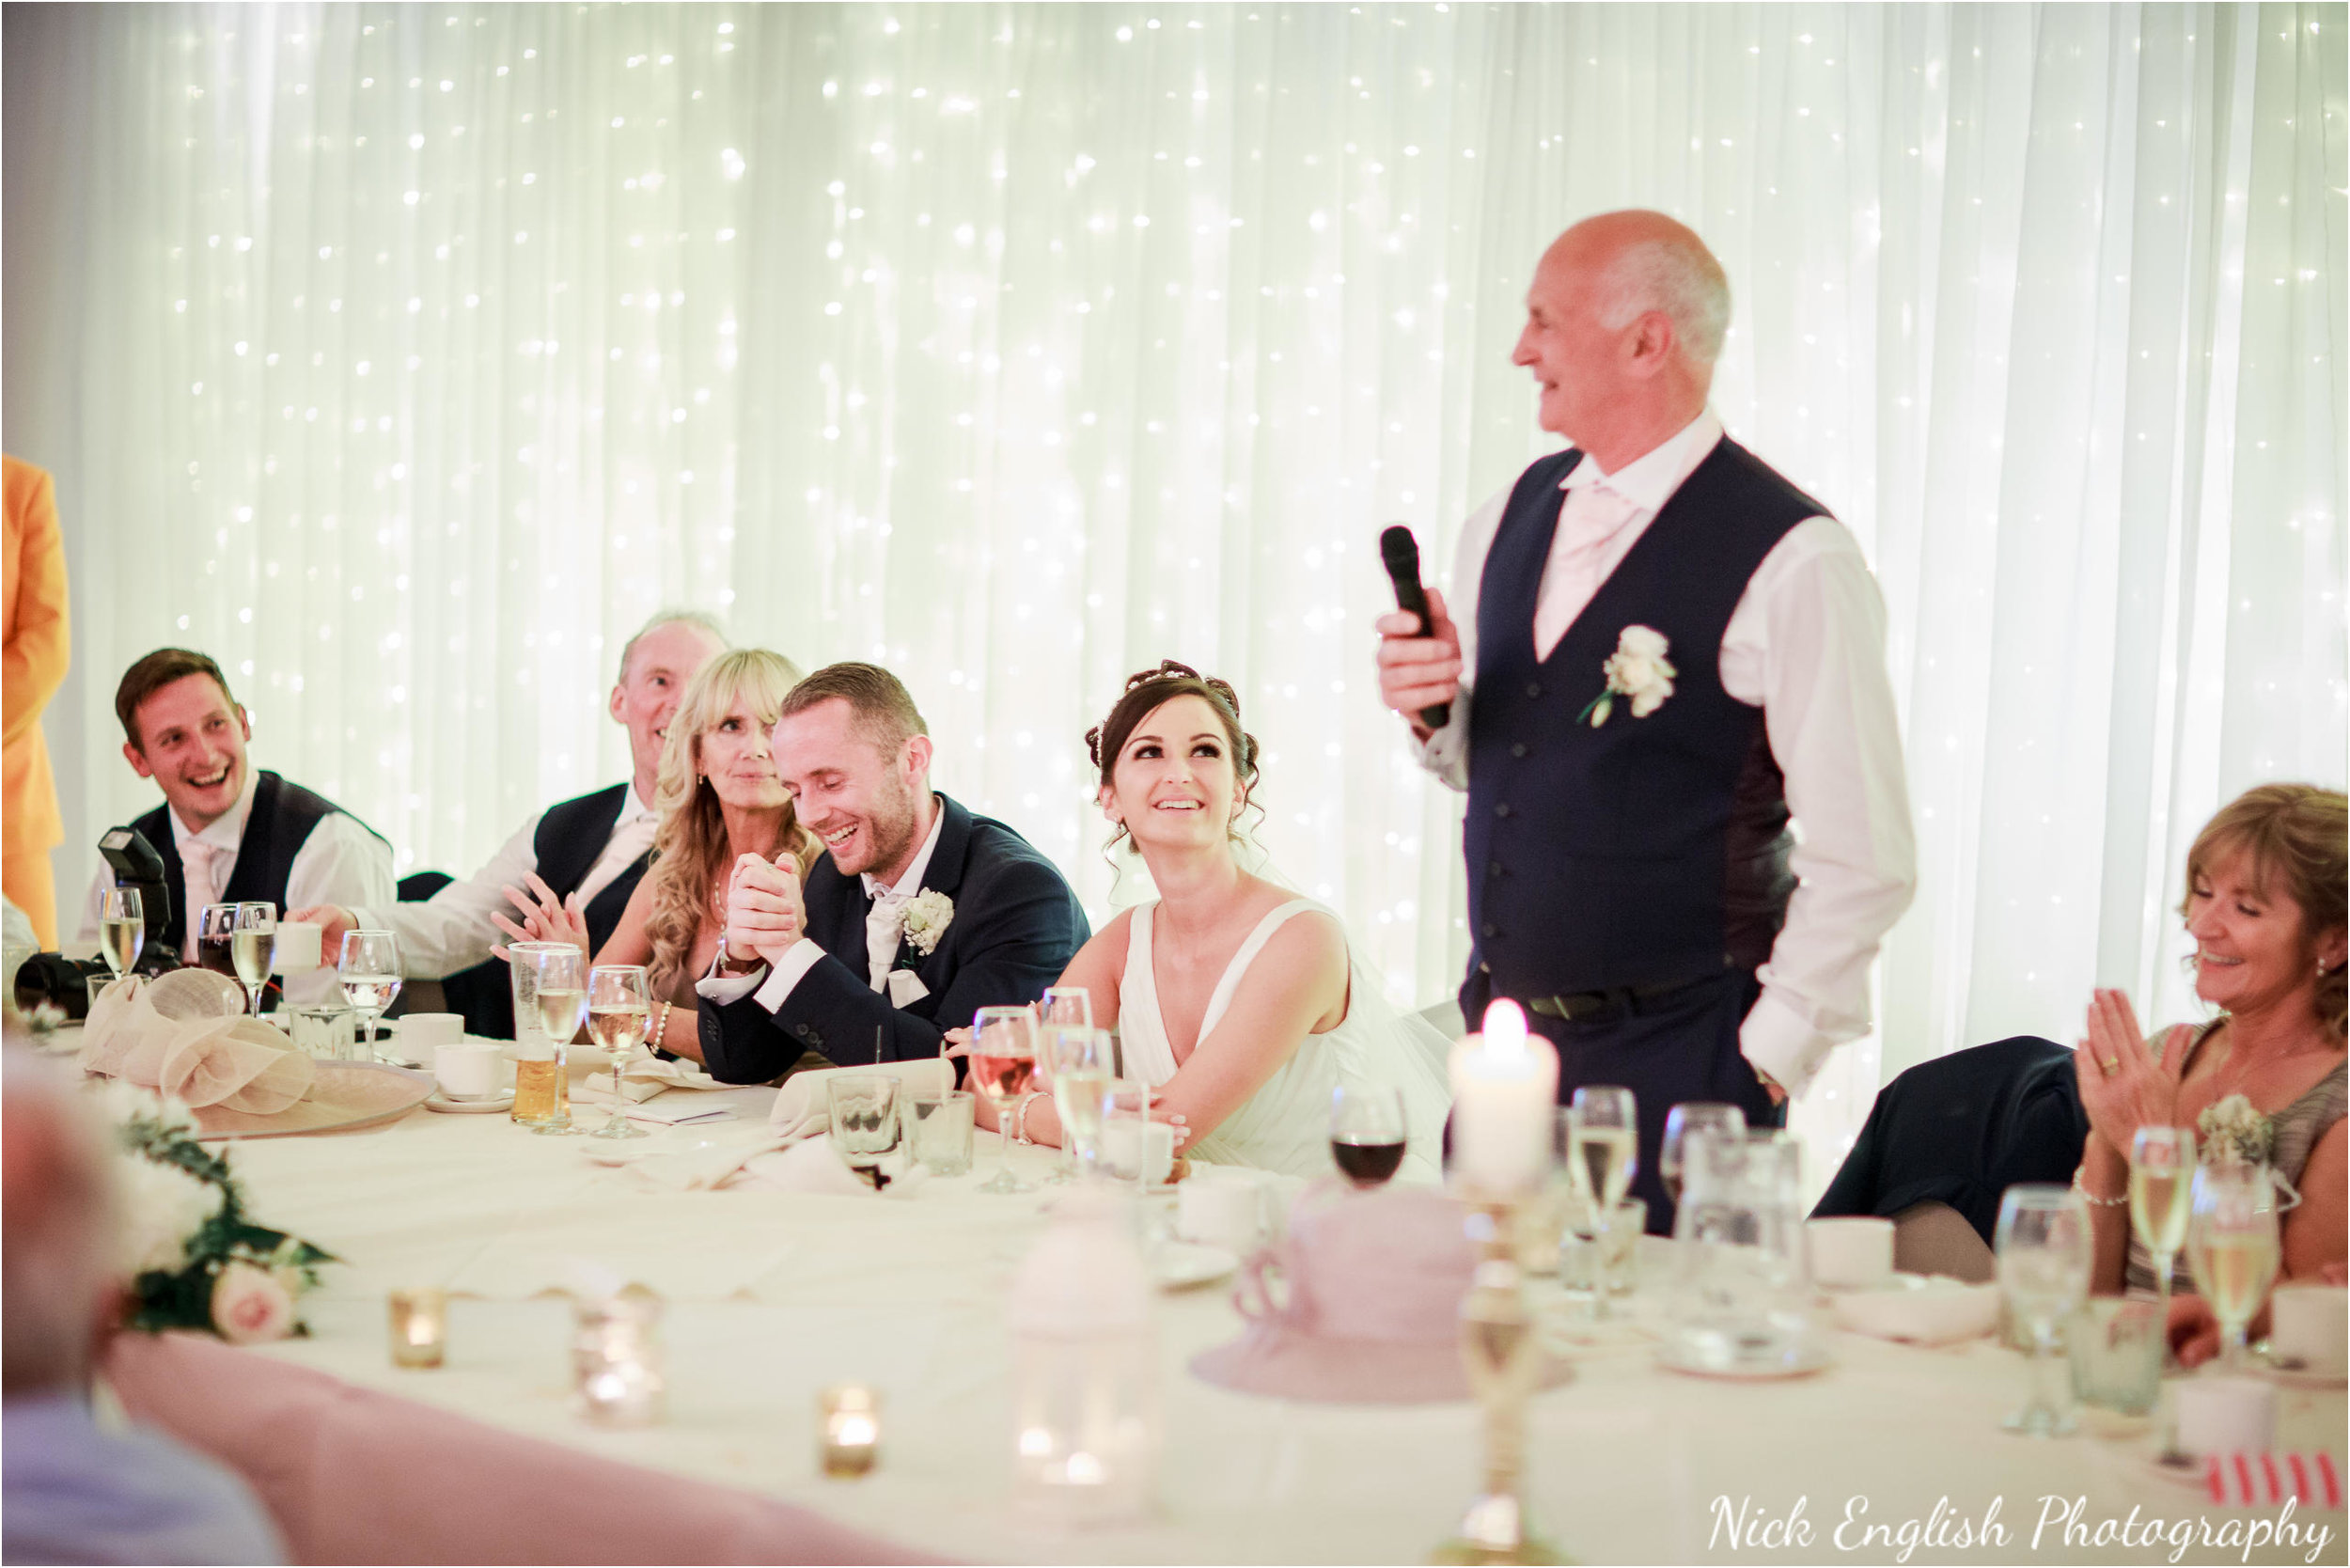 Emily David Wedding Photographs at Barton Grange Preston by Nick English Photography 168jpg.jpeg